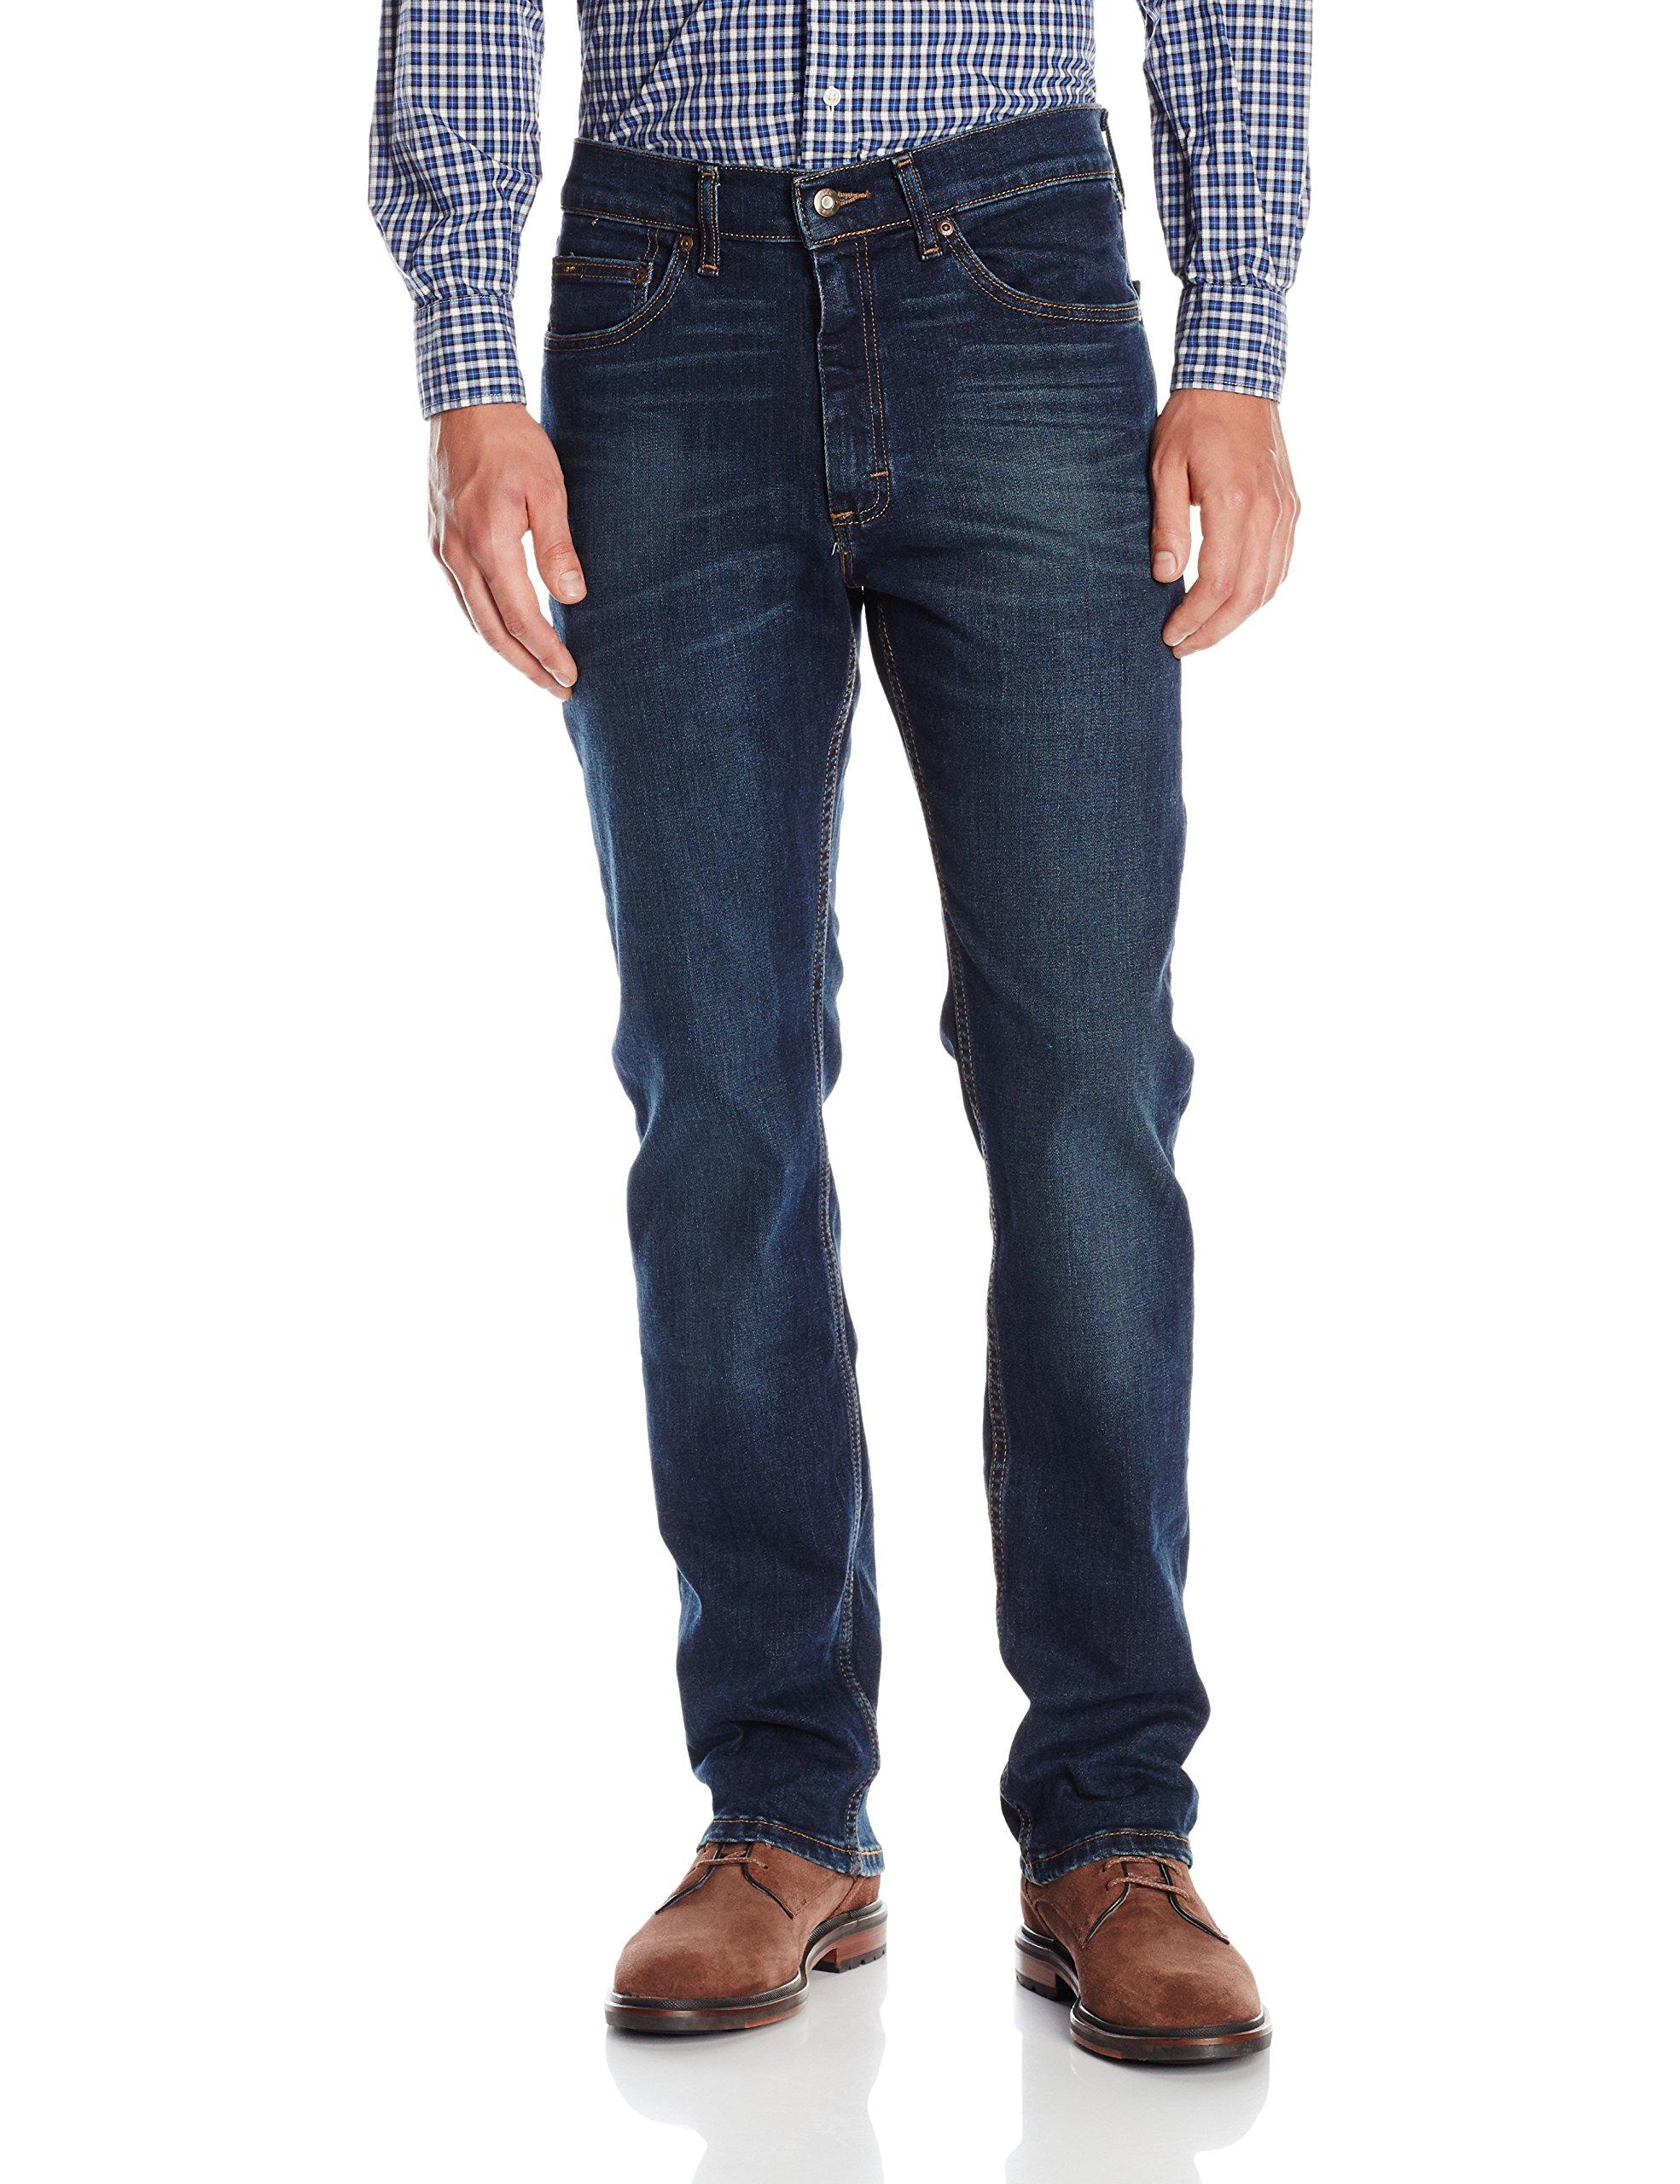 LEE Men's Premium Select Classic-Fit Straight-Leg Jean, Cruiser, 32W x 32L